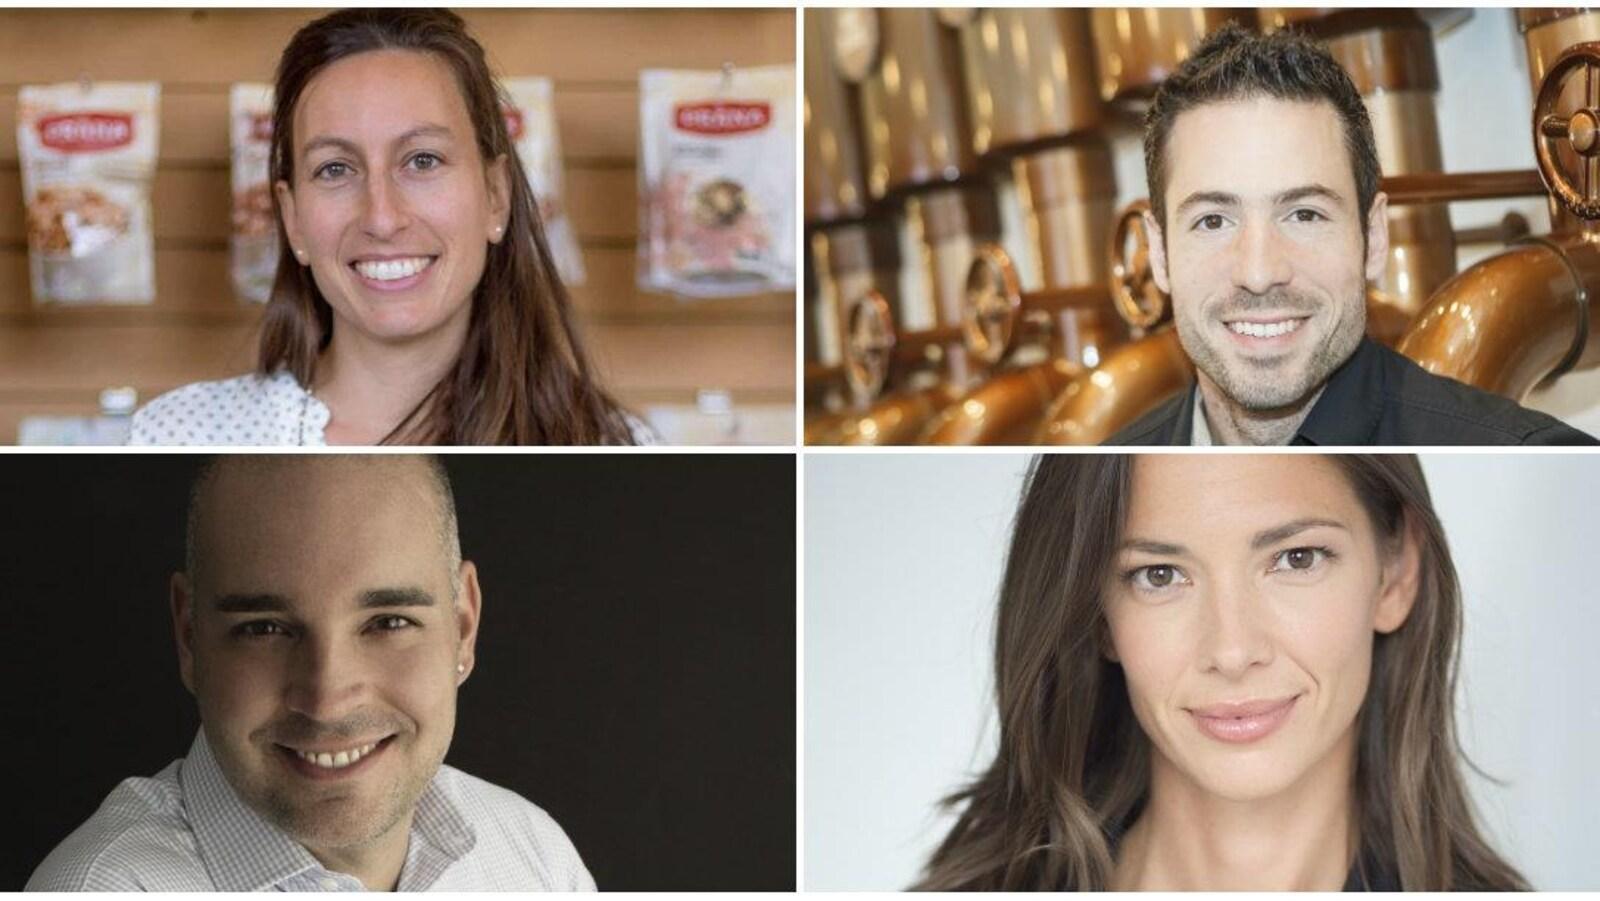 Les quatre portraits des quatre personnes nommées.